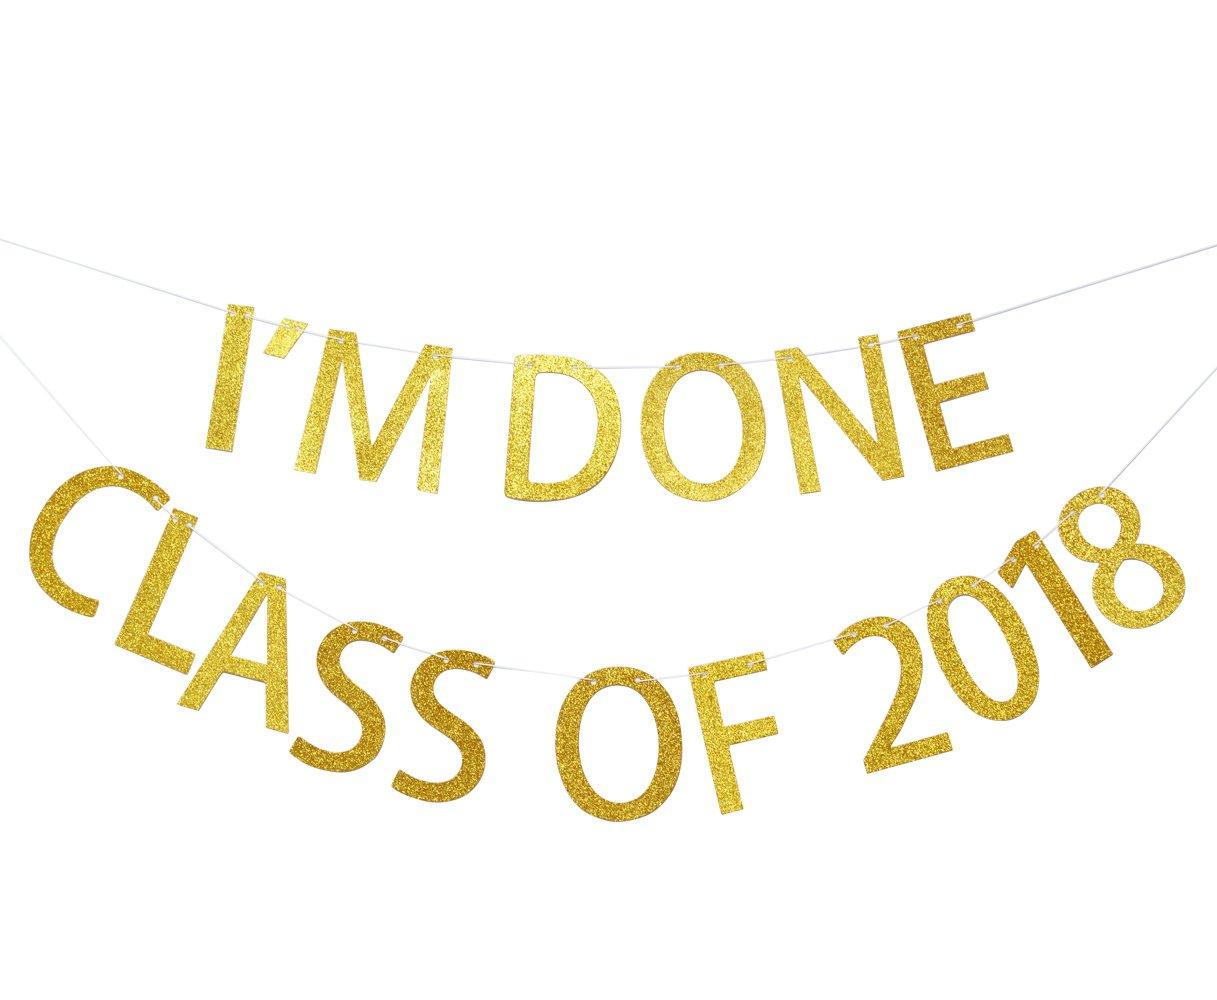 I'm Done! Class of 2018 Gold & Black Glitter Banner, 2018 Graduation Sign Photo Props Graduate Party Decorations High School Graduation College Grad Decor